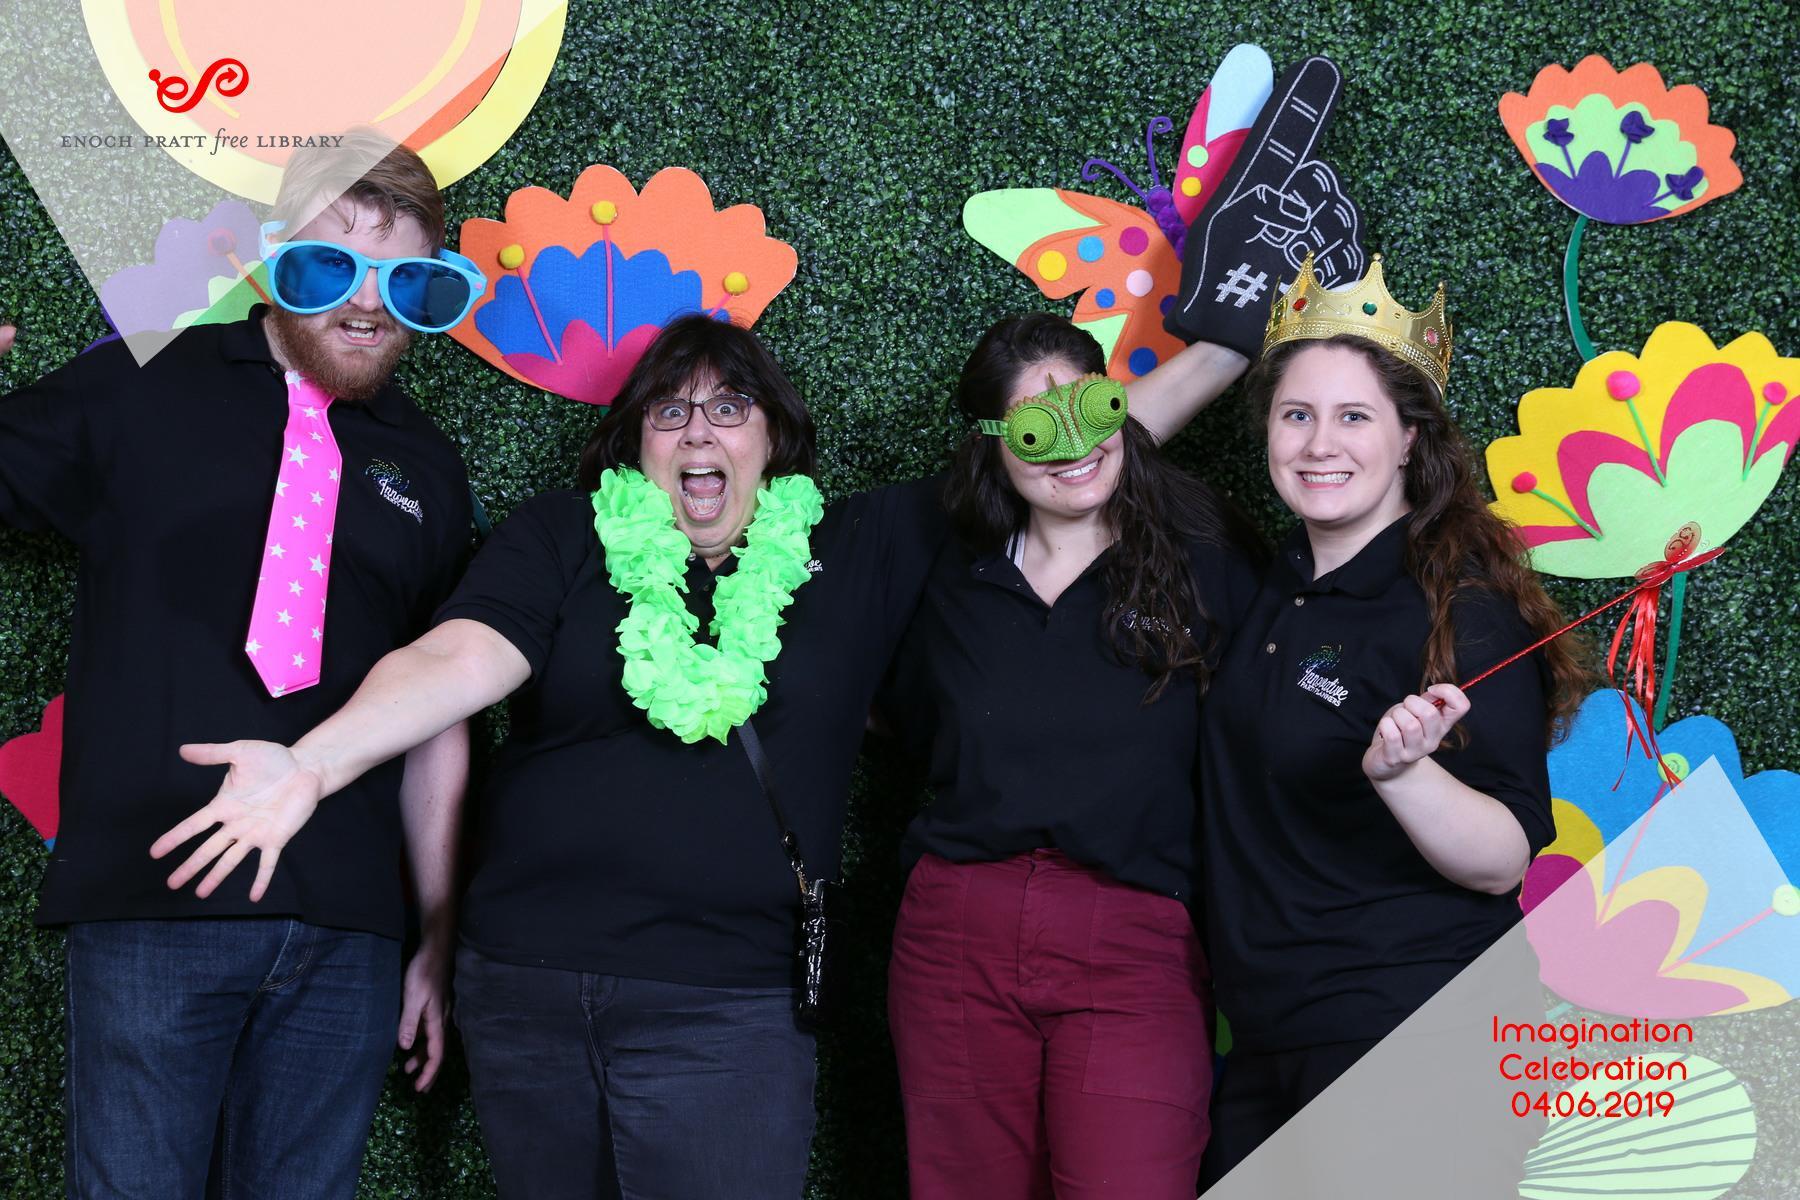 Innovative Party Planners at Enoch Pratt Event.jpg